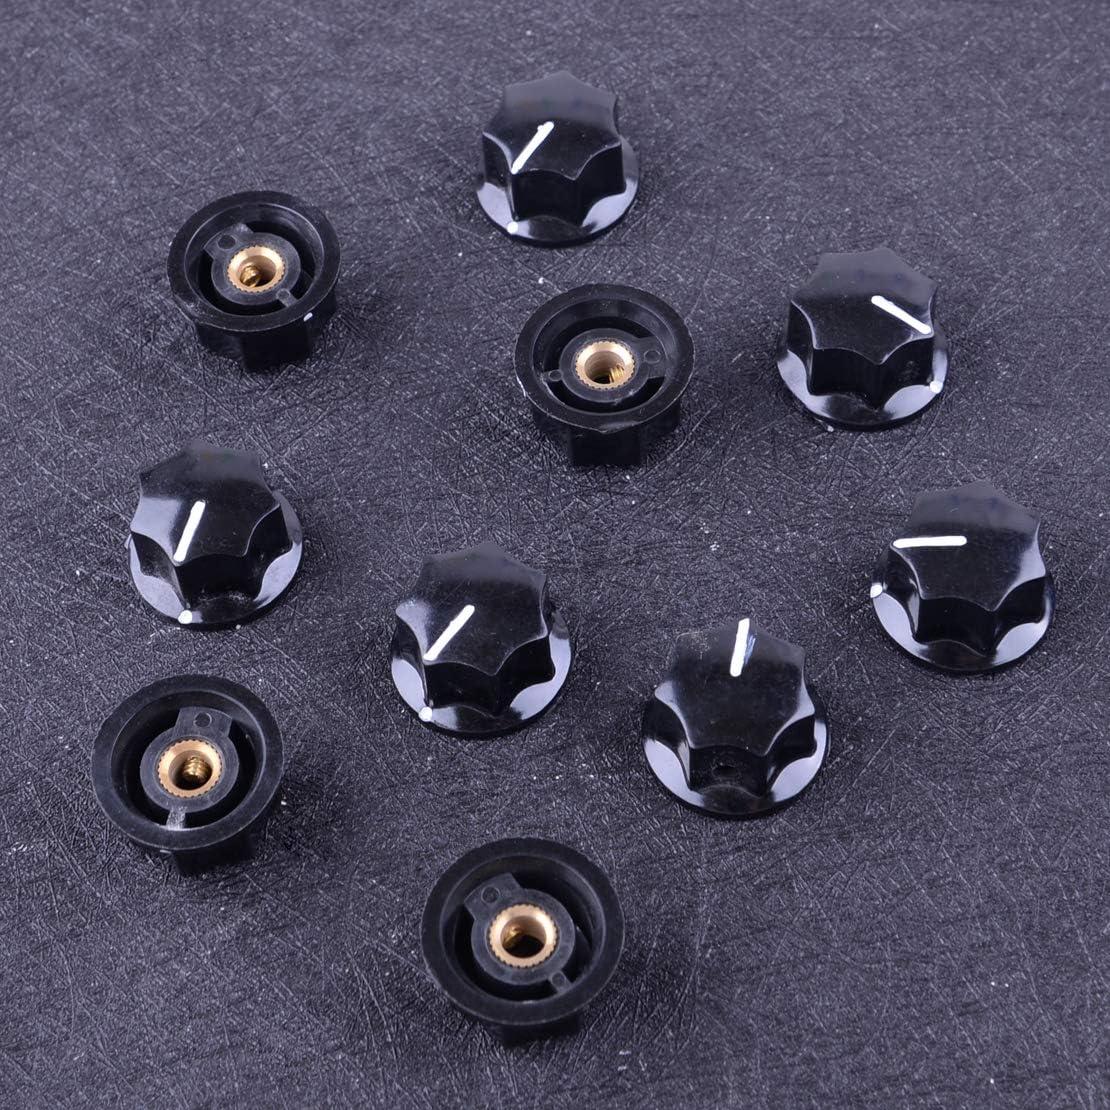 LETAOSK 10pcs Bakelite Skirted Pedal Control Knob 27mmDx15mmH 6mm Shaft